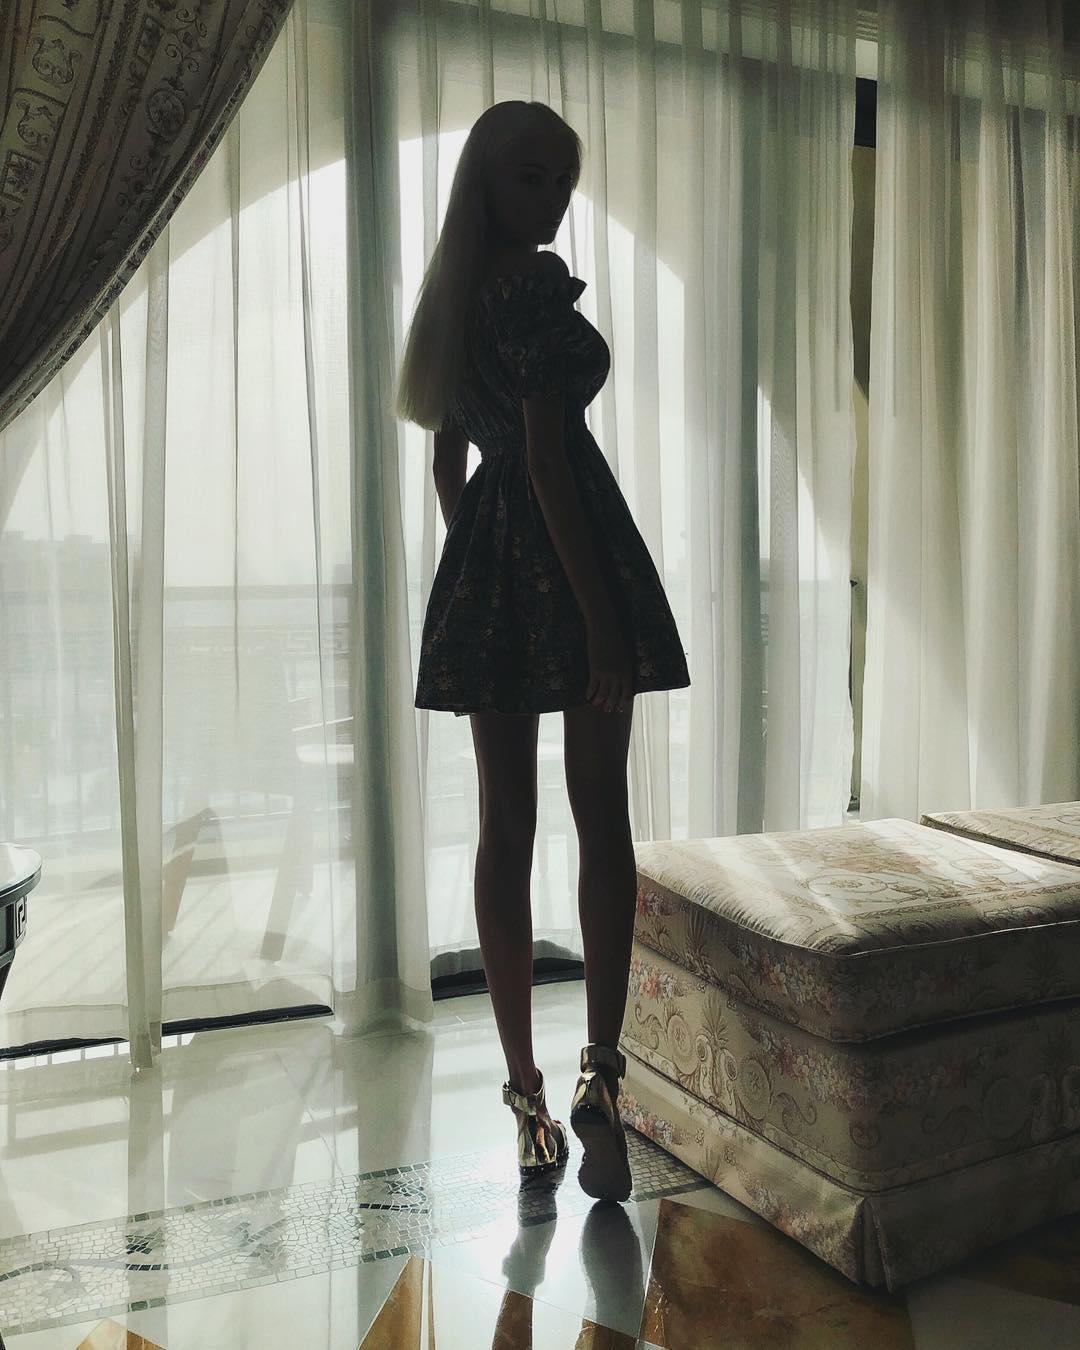 Алёна Шишкова (224 фото из Инстаграм) » Страница 3 ... миранда керр рост вес